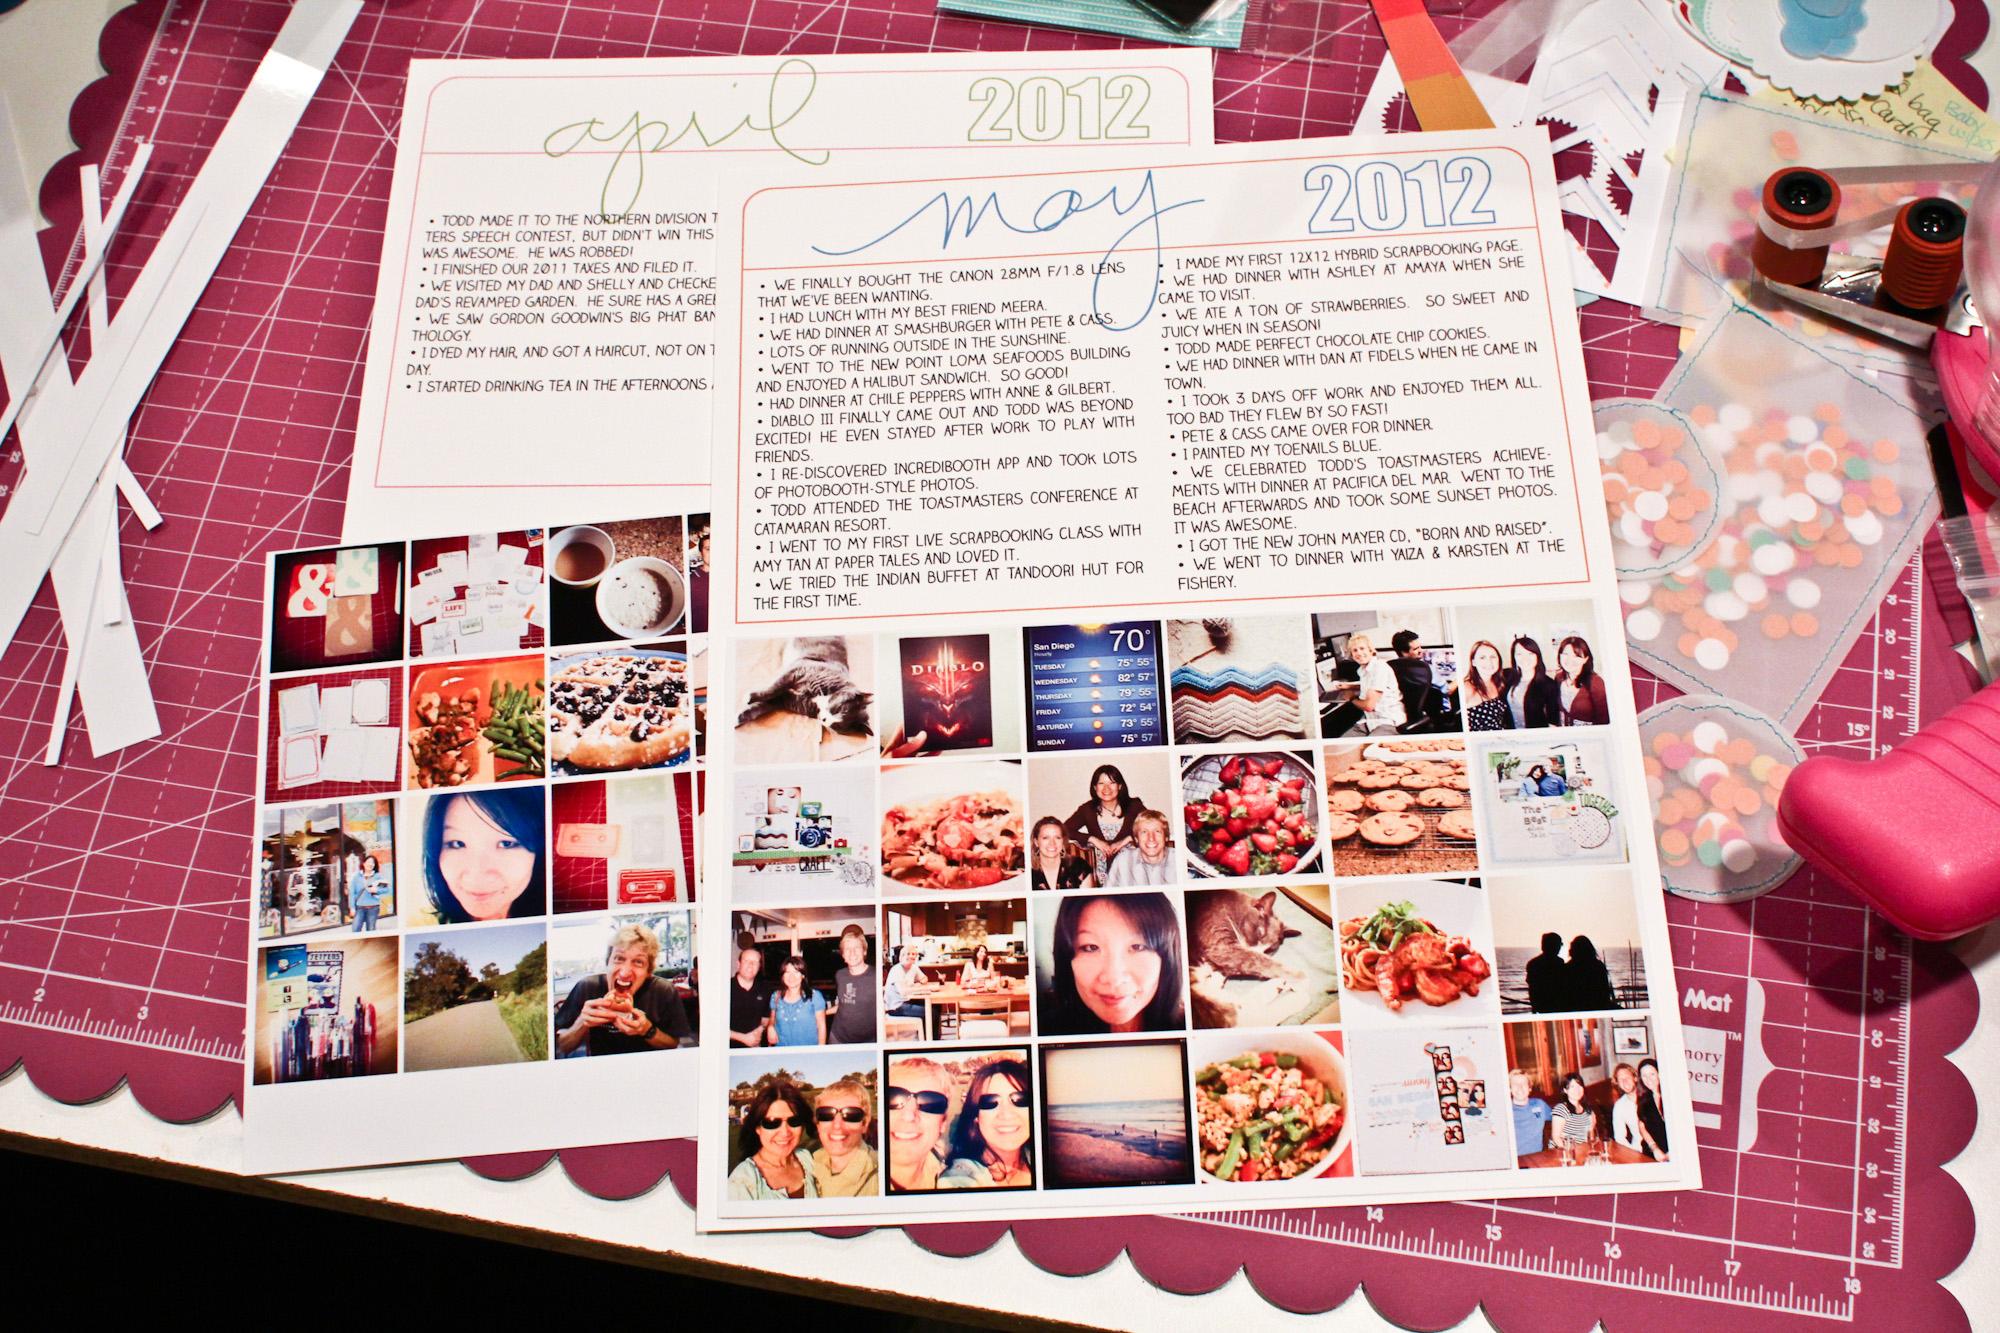 Scrapbook ideas about life - Christinenewman_5